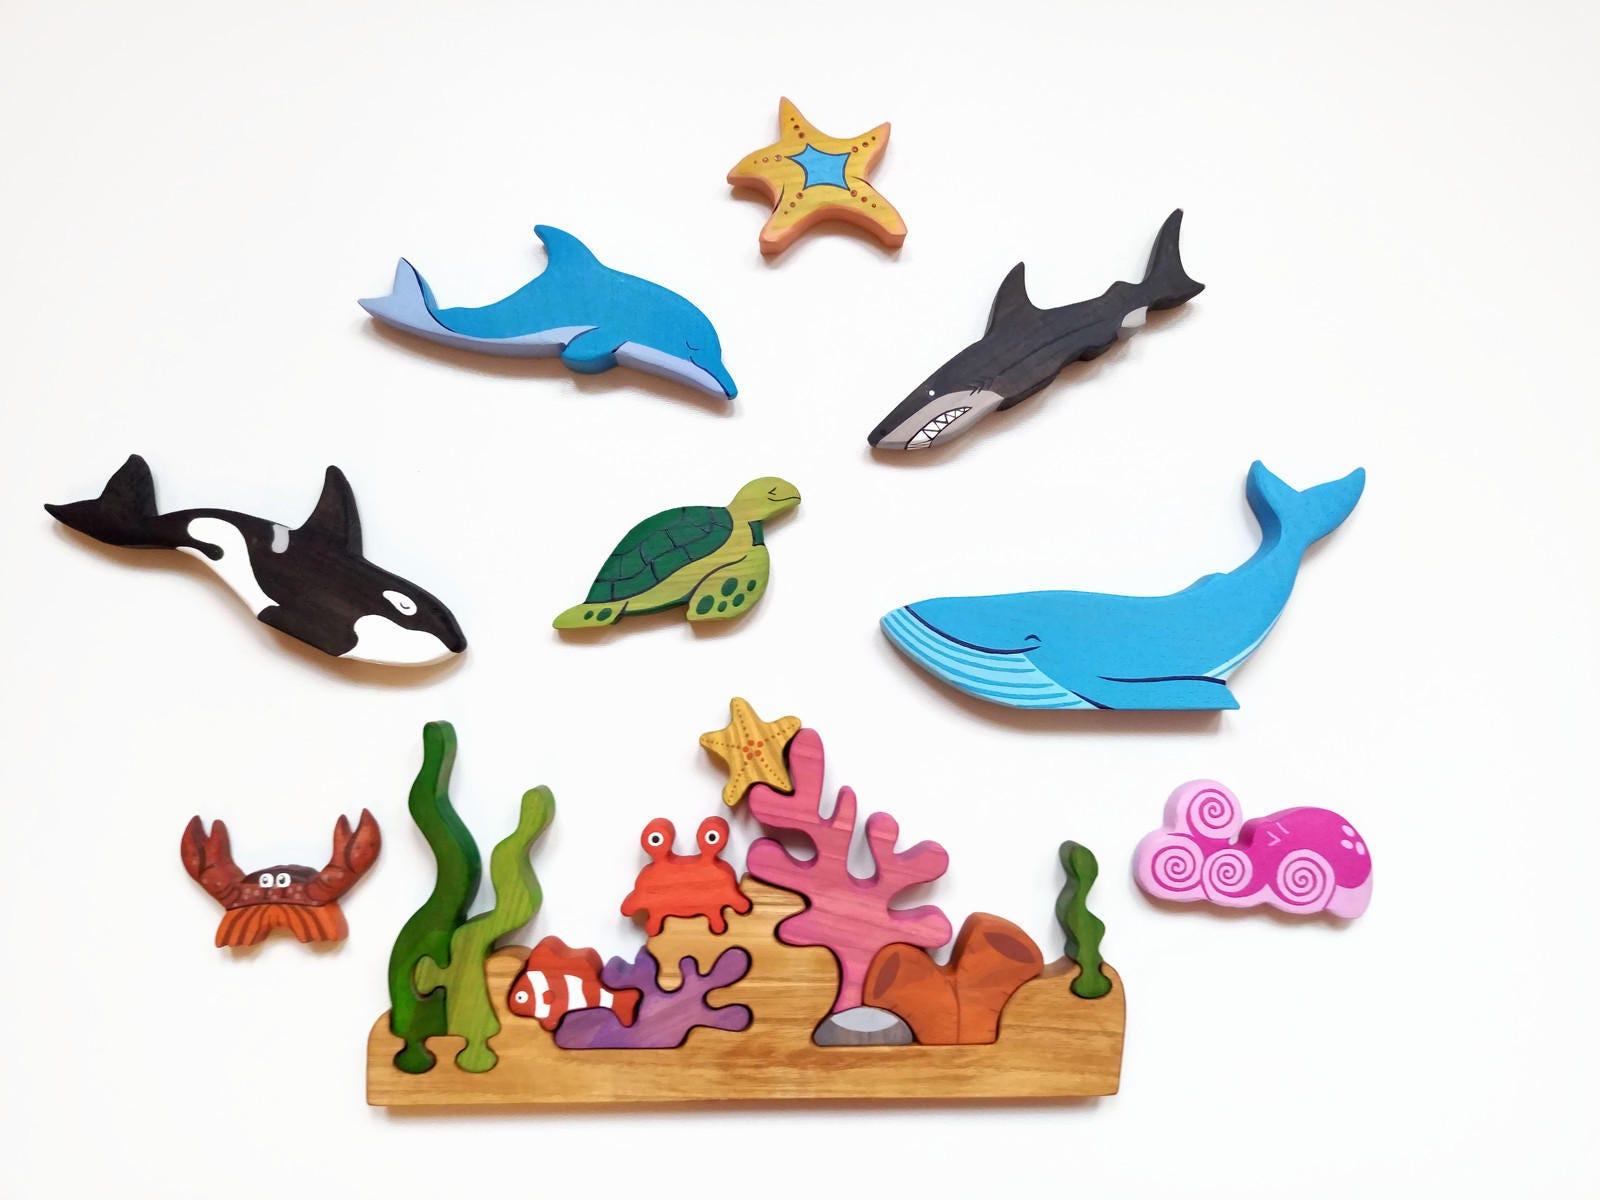 Big Sea Set Ocean animals Play set Marine toys Waldorf nature